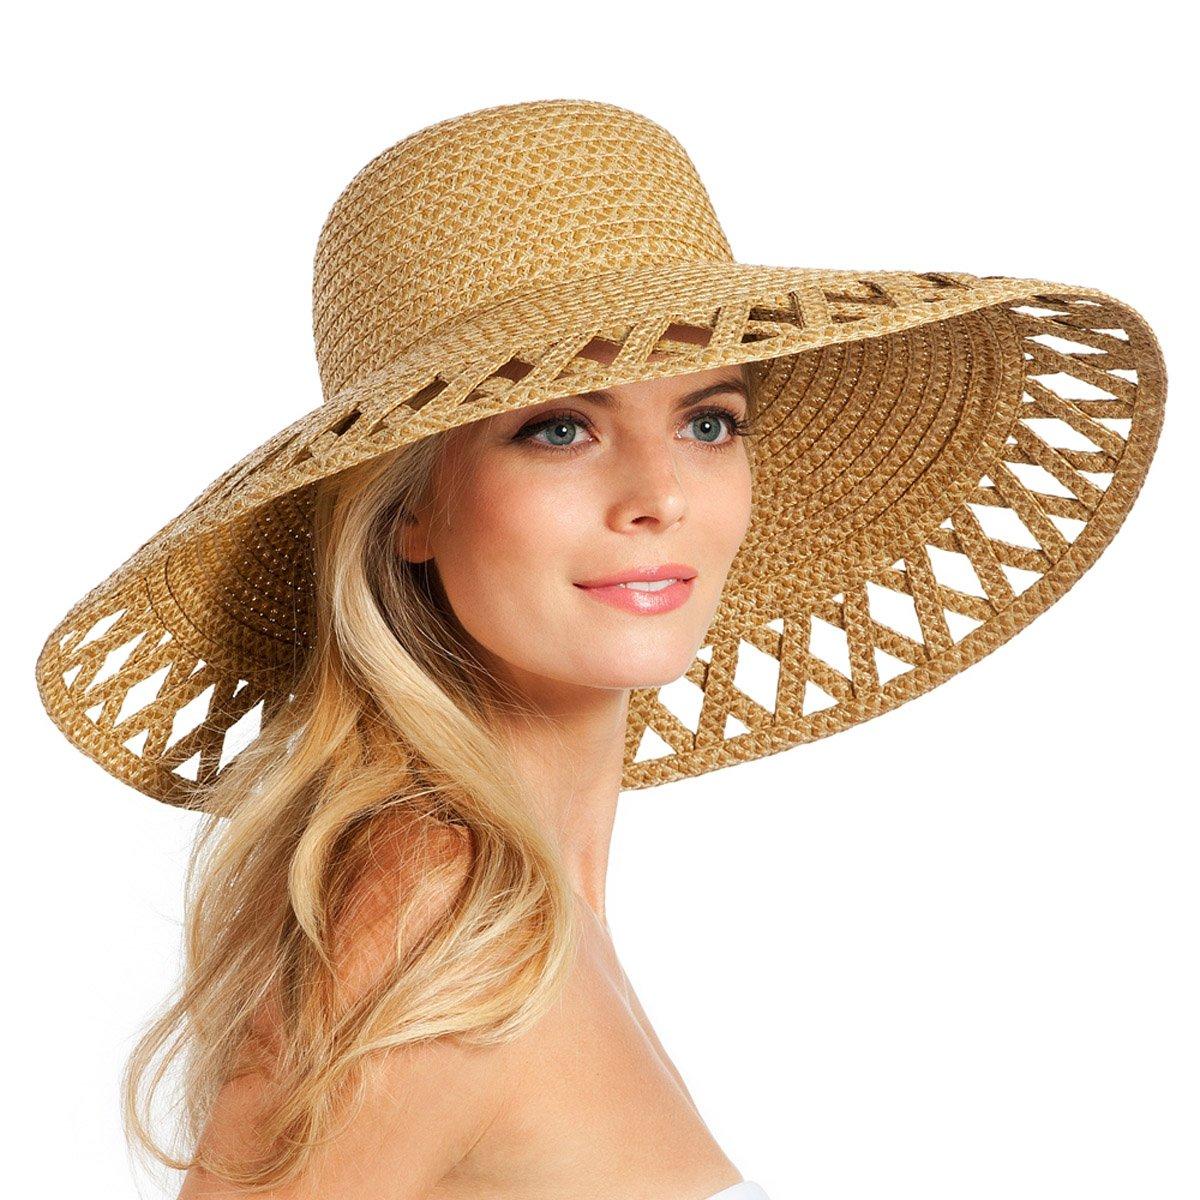 Eric Javits Luxury Fashion Designer Women's Headwear Hat - Maribel - Natural by Eric Javits